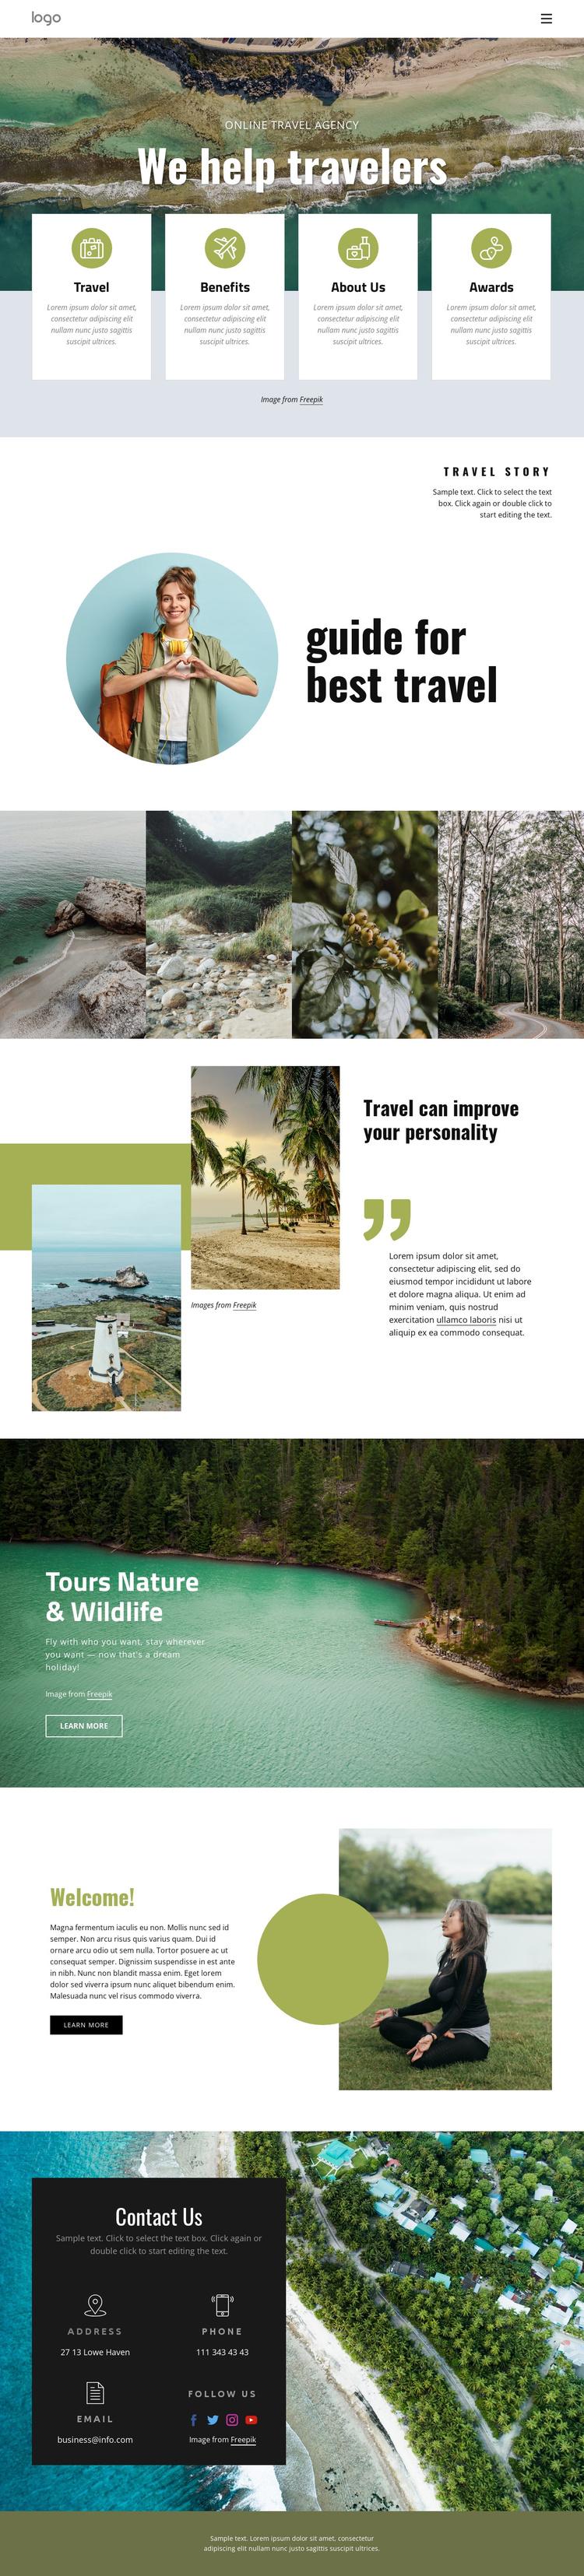 We help manage your trip Joomla Template